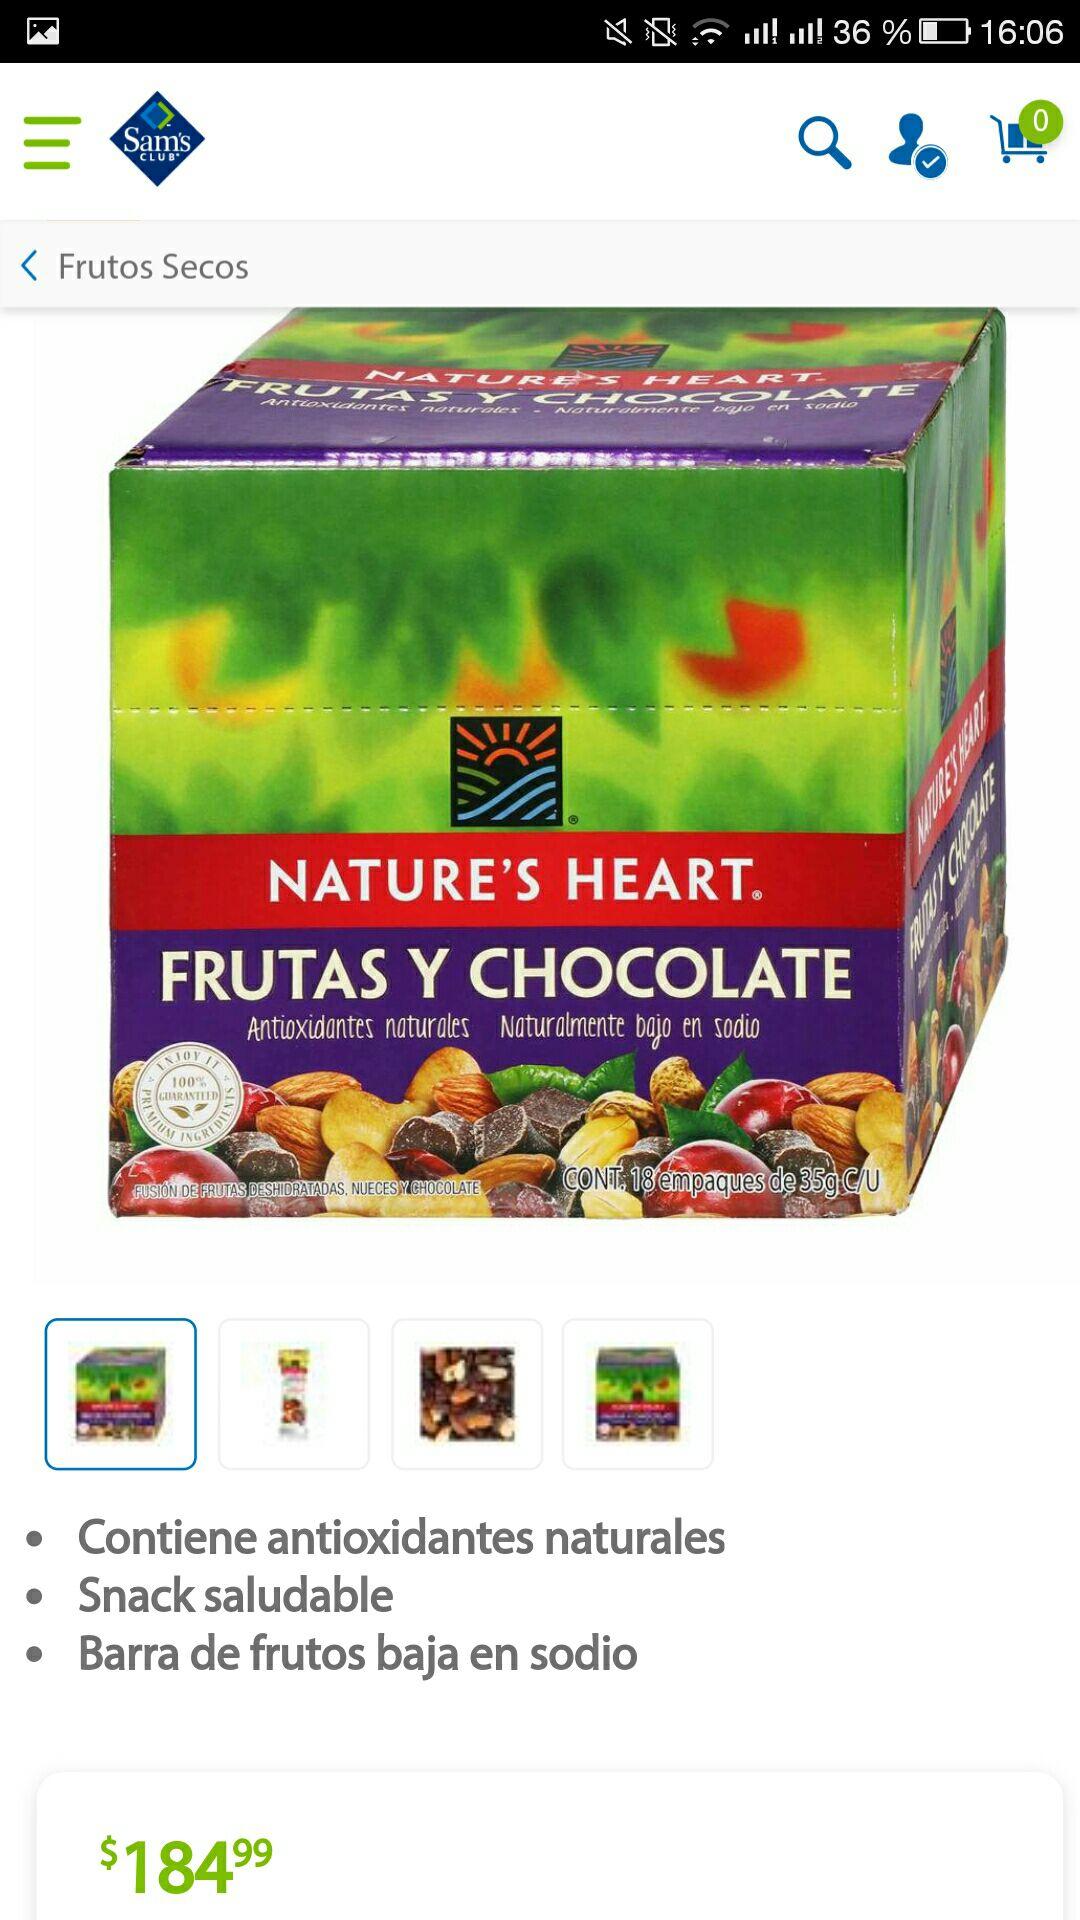 Sam's club online: snack saludable natures hearth 2x1 36 bolsitas ($5 por bolsa)